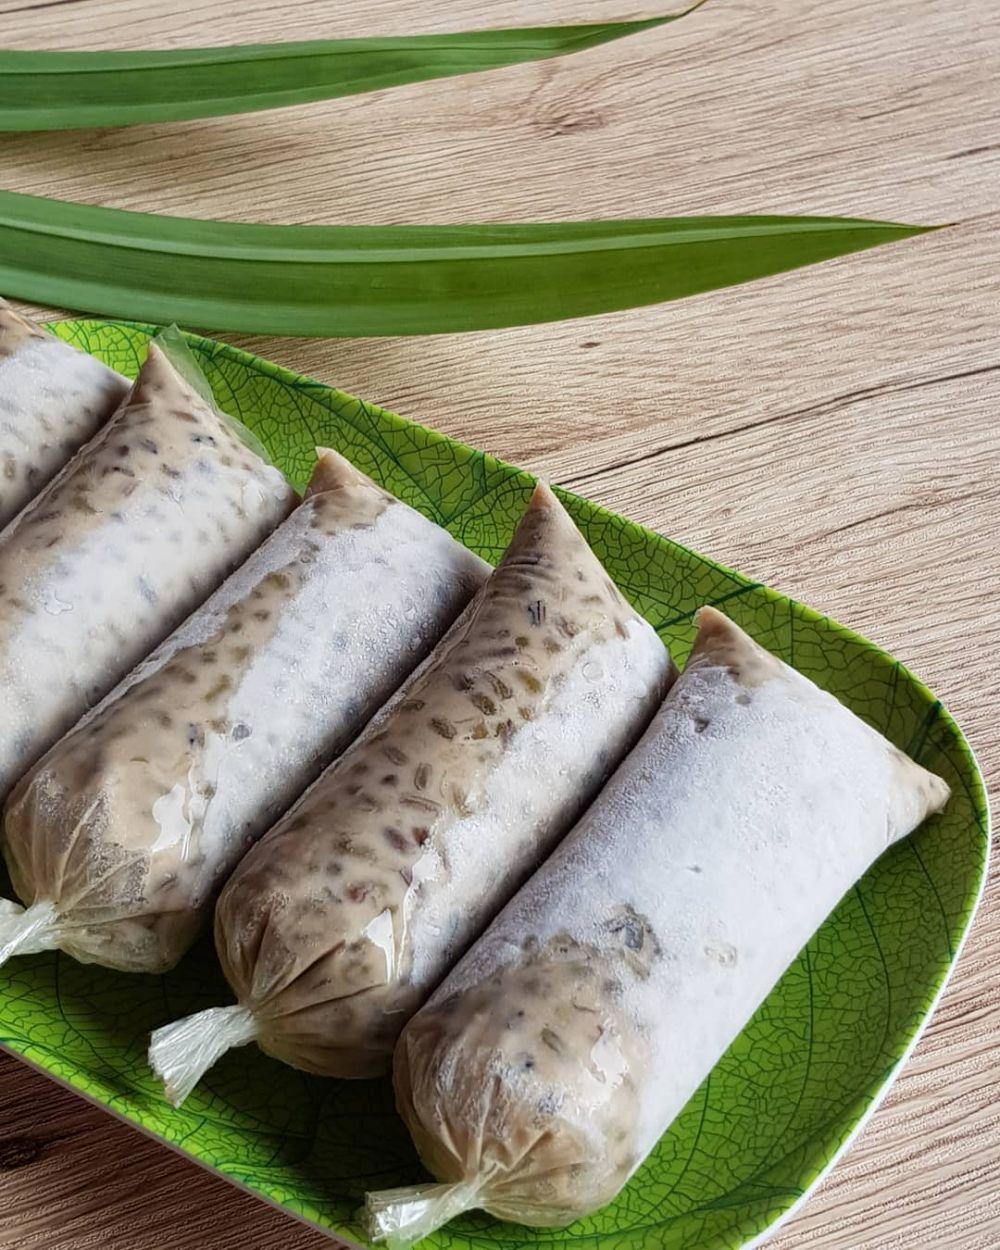 10 Resep Es Lilin Untuk Dijual Antimainstream 2020 Resep Lilin Kacang